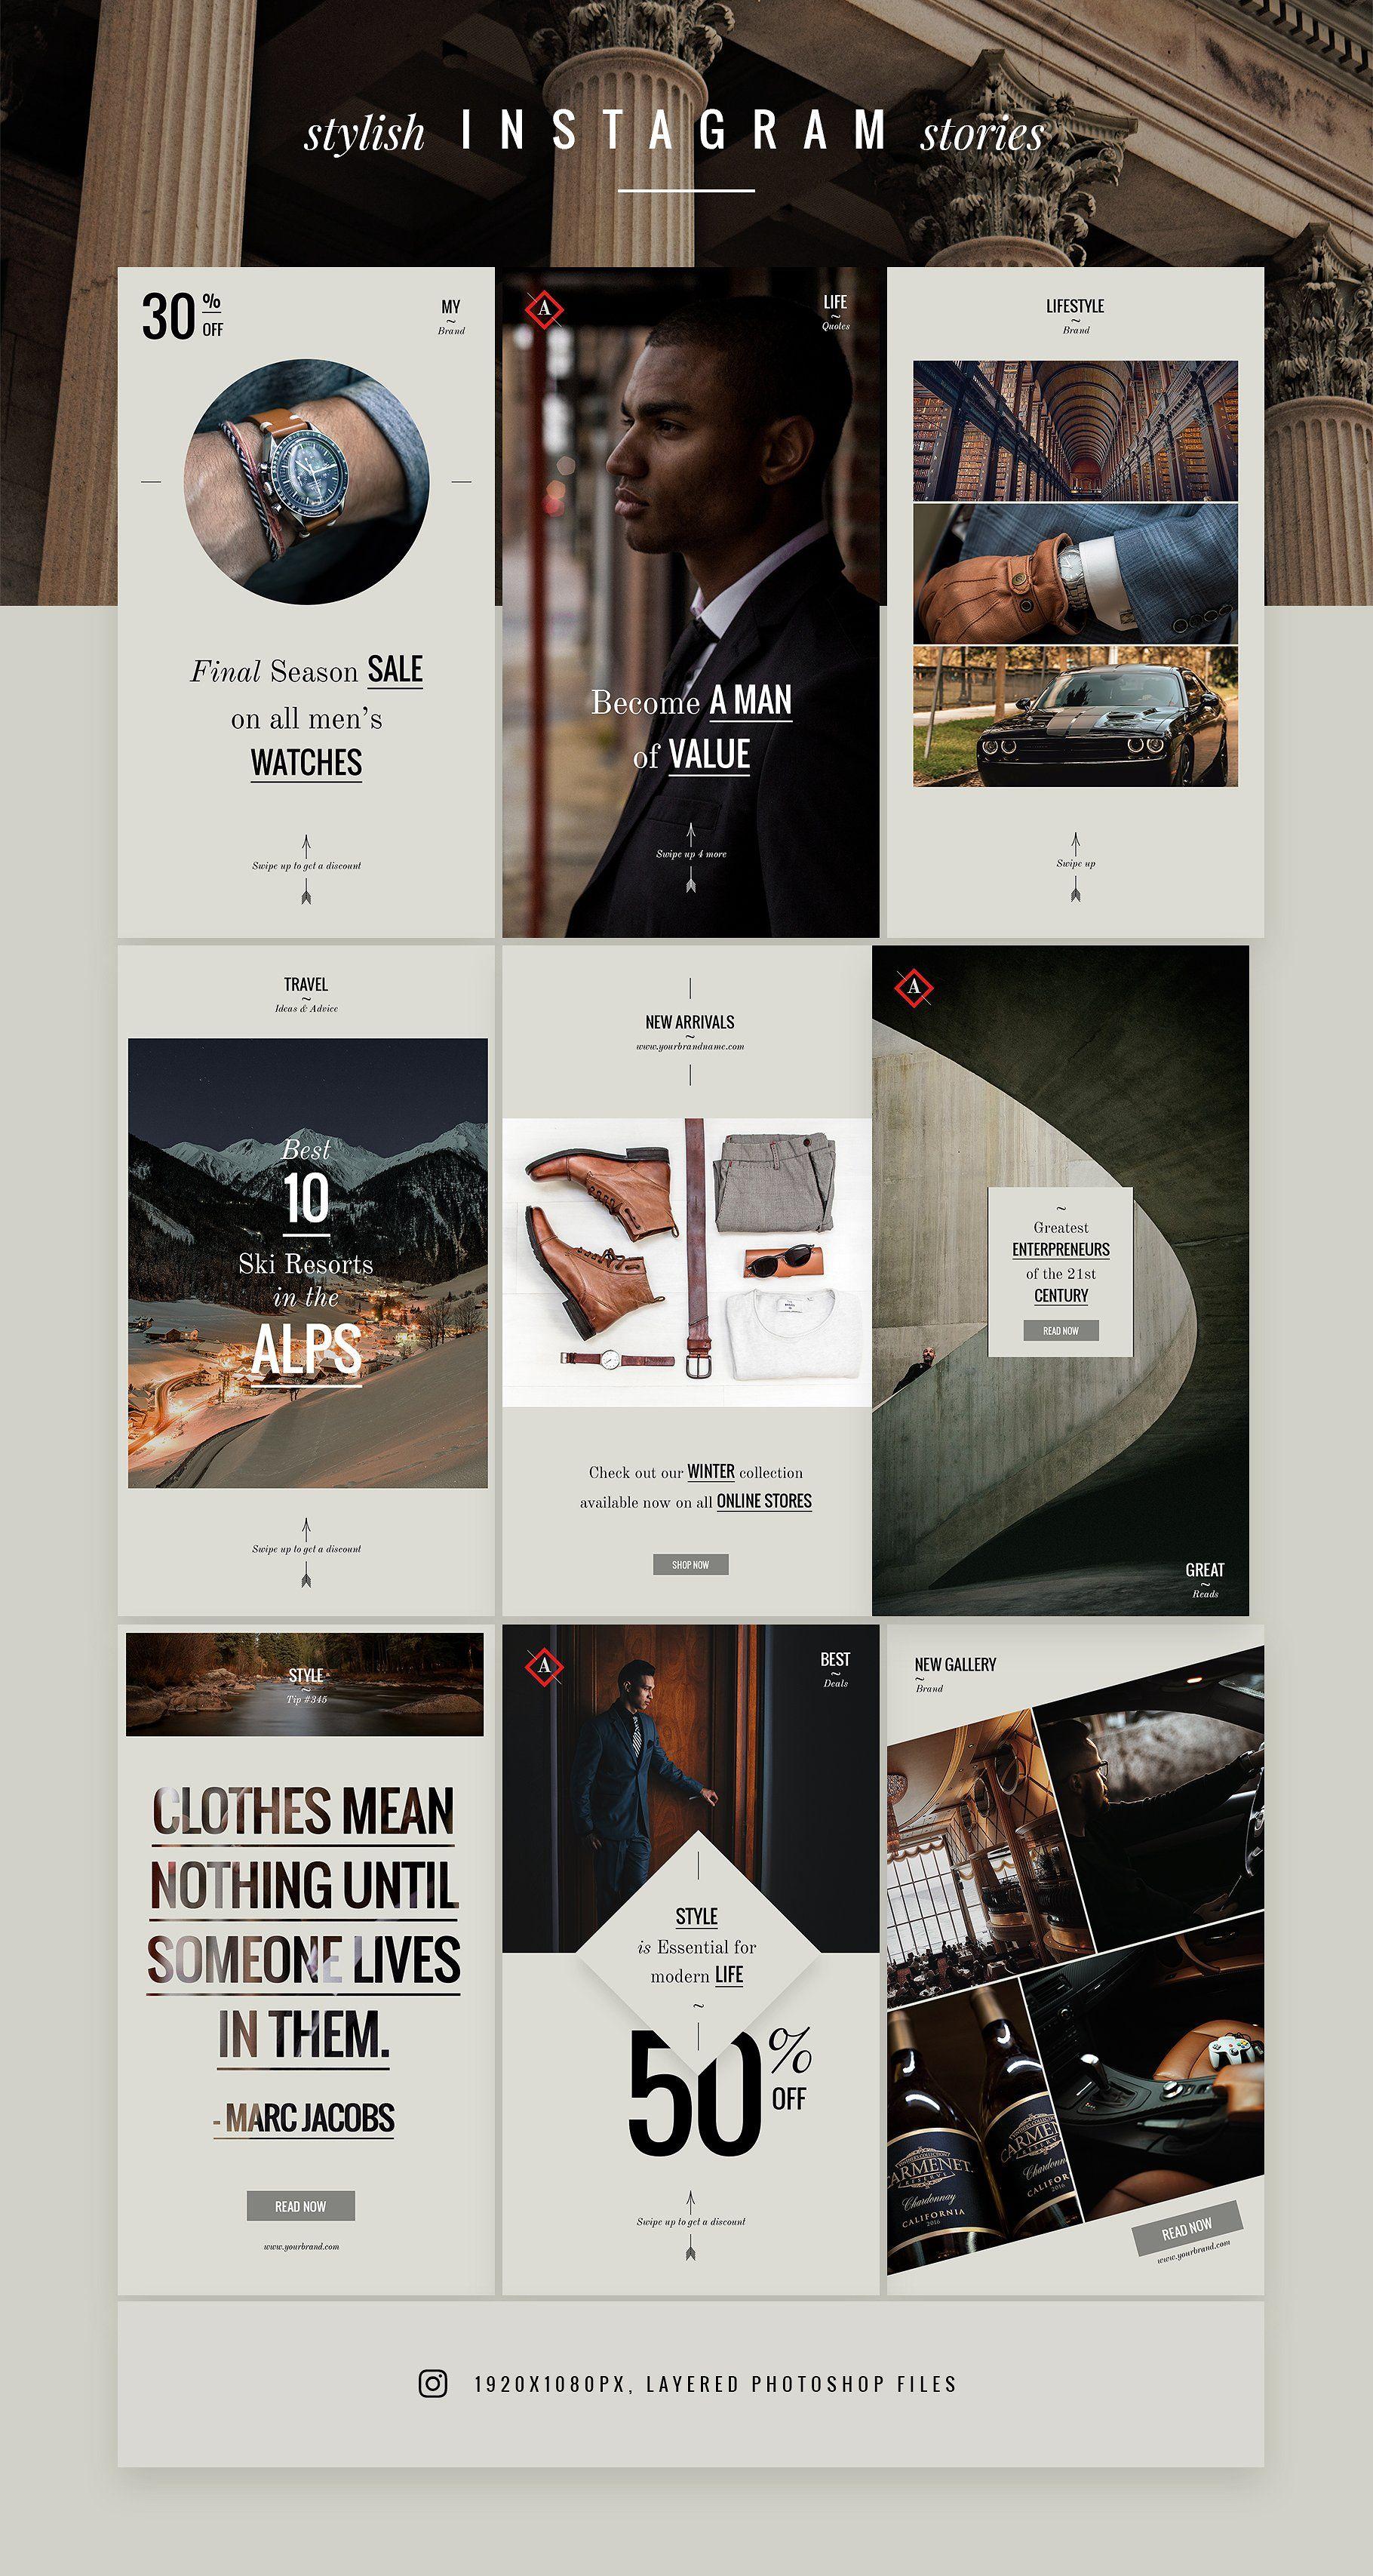 Aston Luxury Lifestyle Brand Social Media Design Instagram Design Instagram Template Design